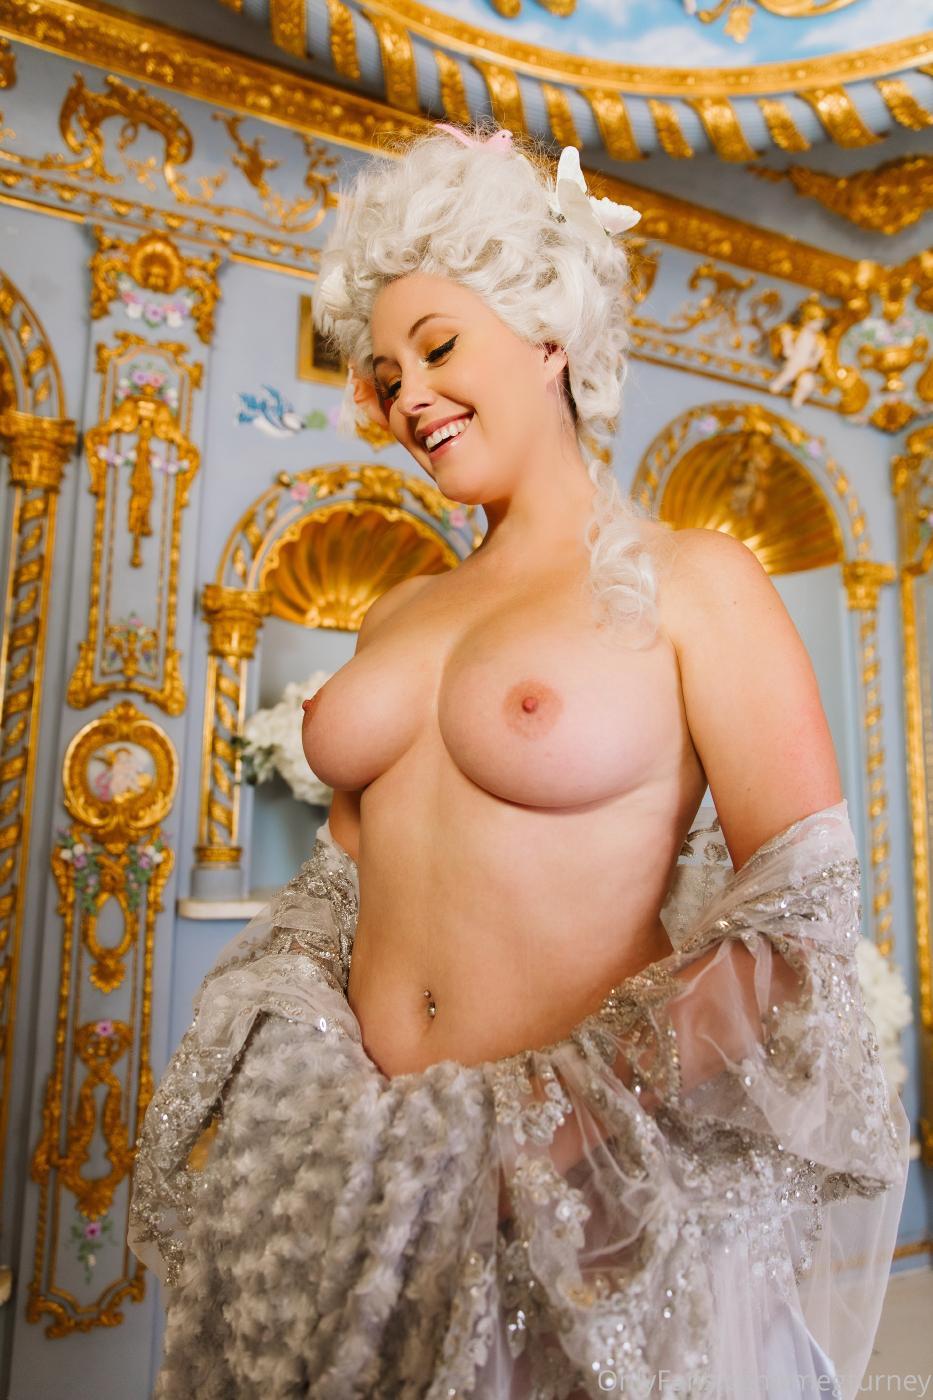 Meg Turney Nude Pussy Marie Antoinette Cosplay Onlyfans Set Leaked Ehpljh